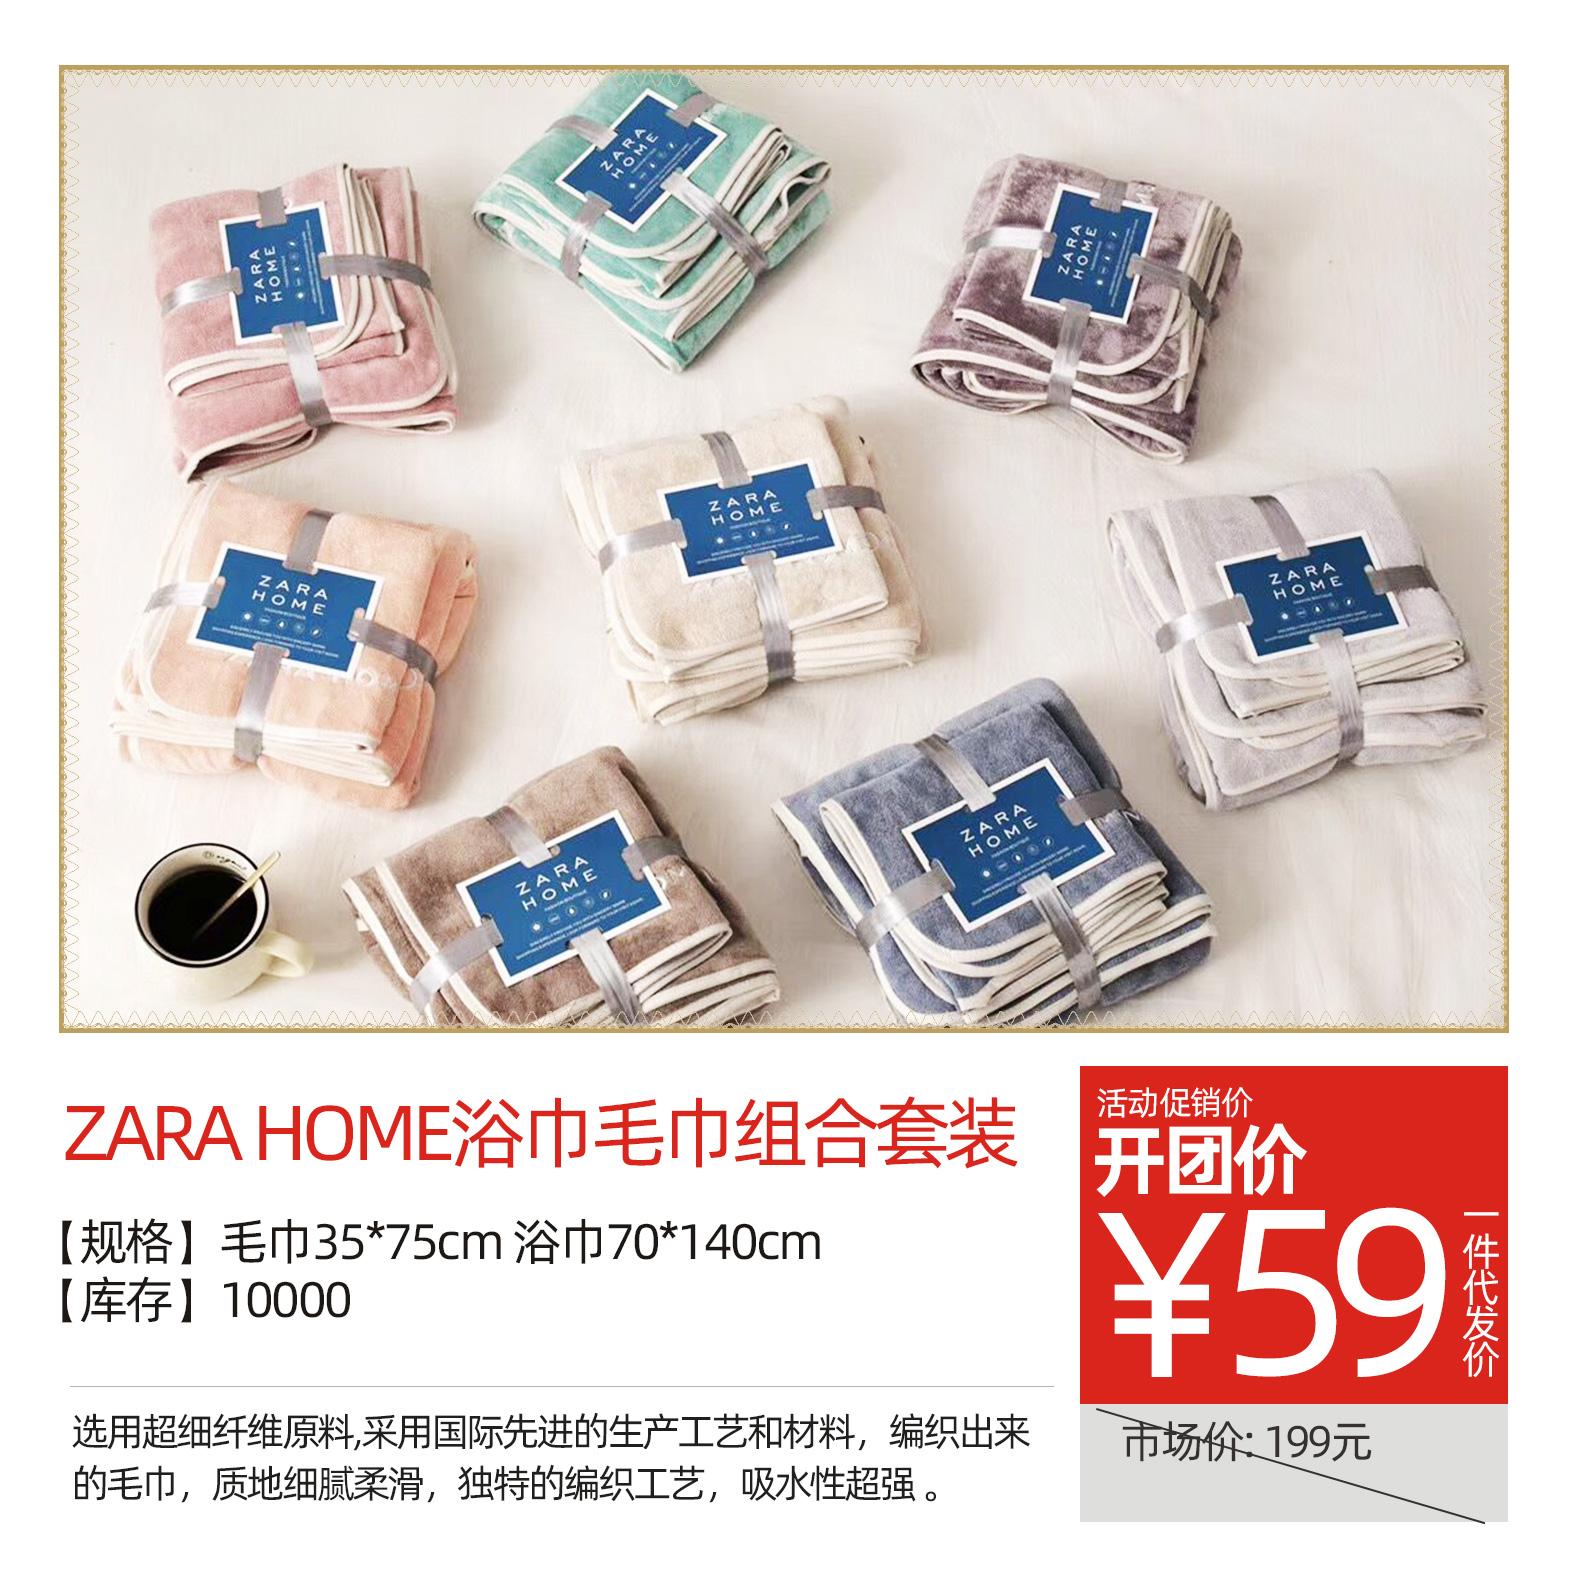 ZARA HOME浴巾毛巾组合套装